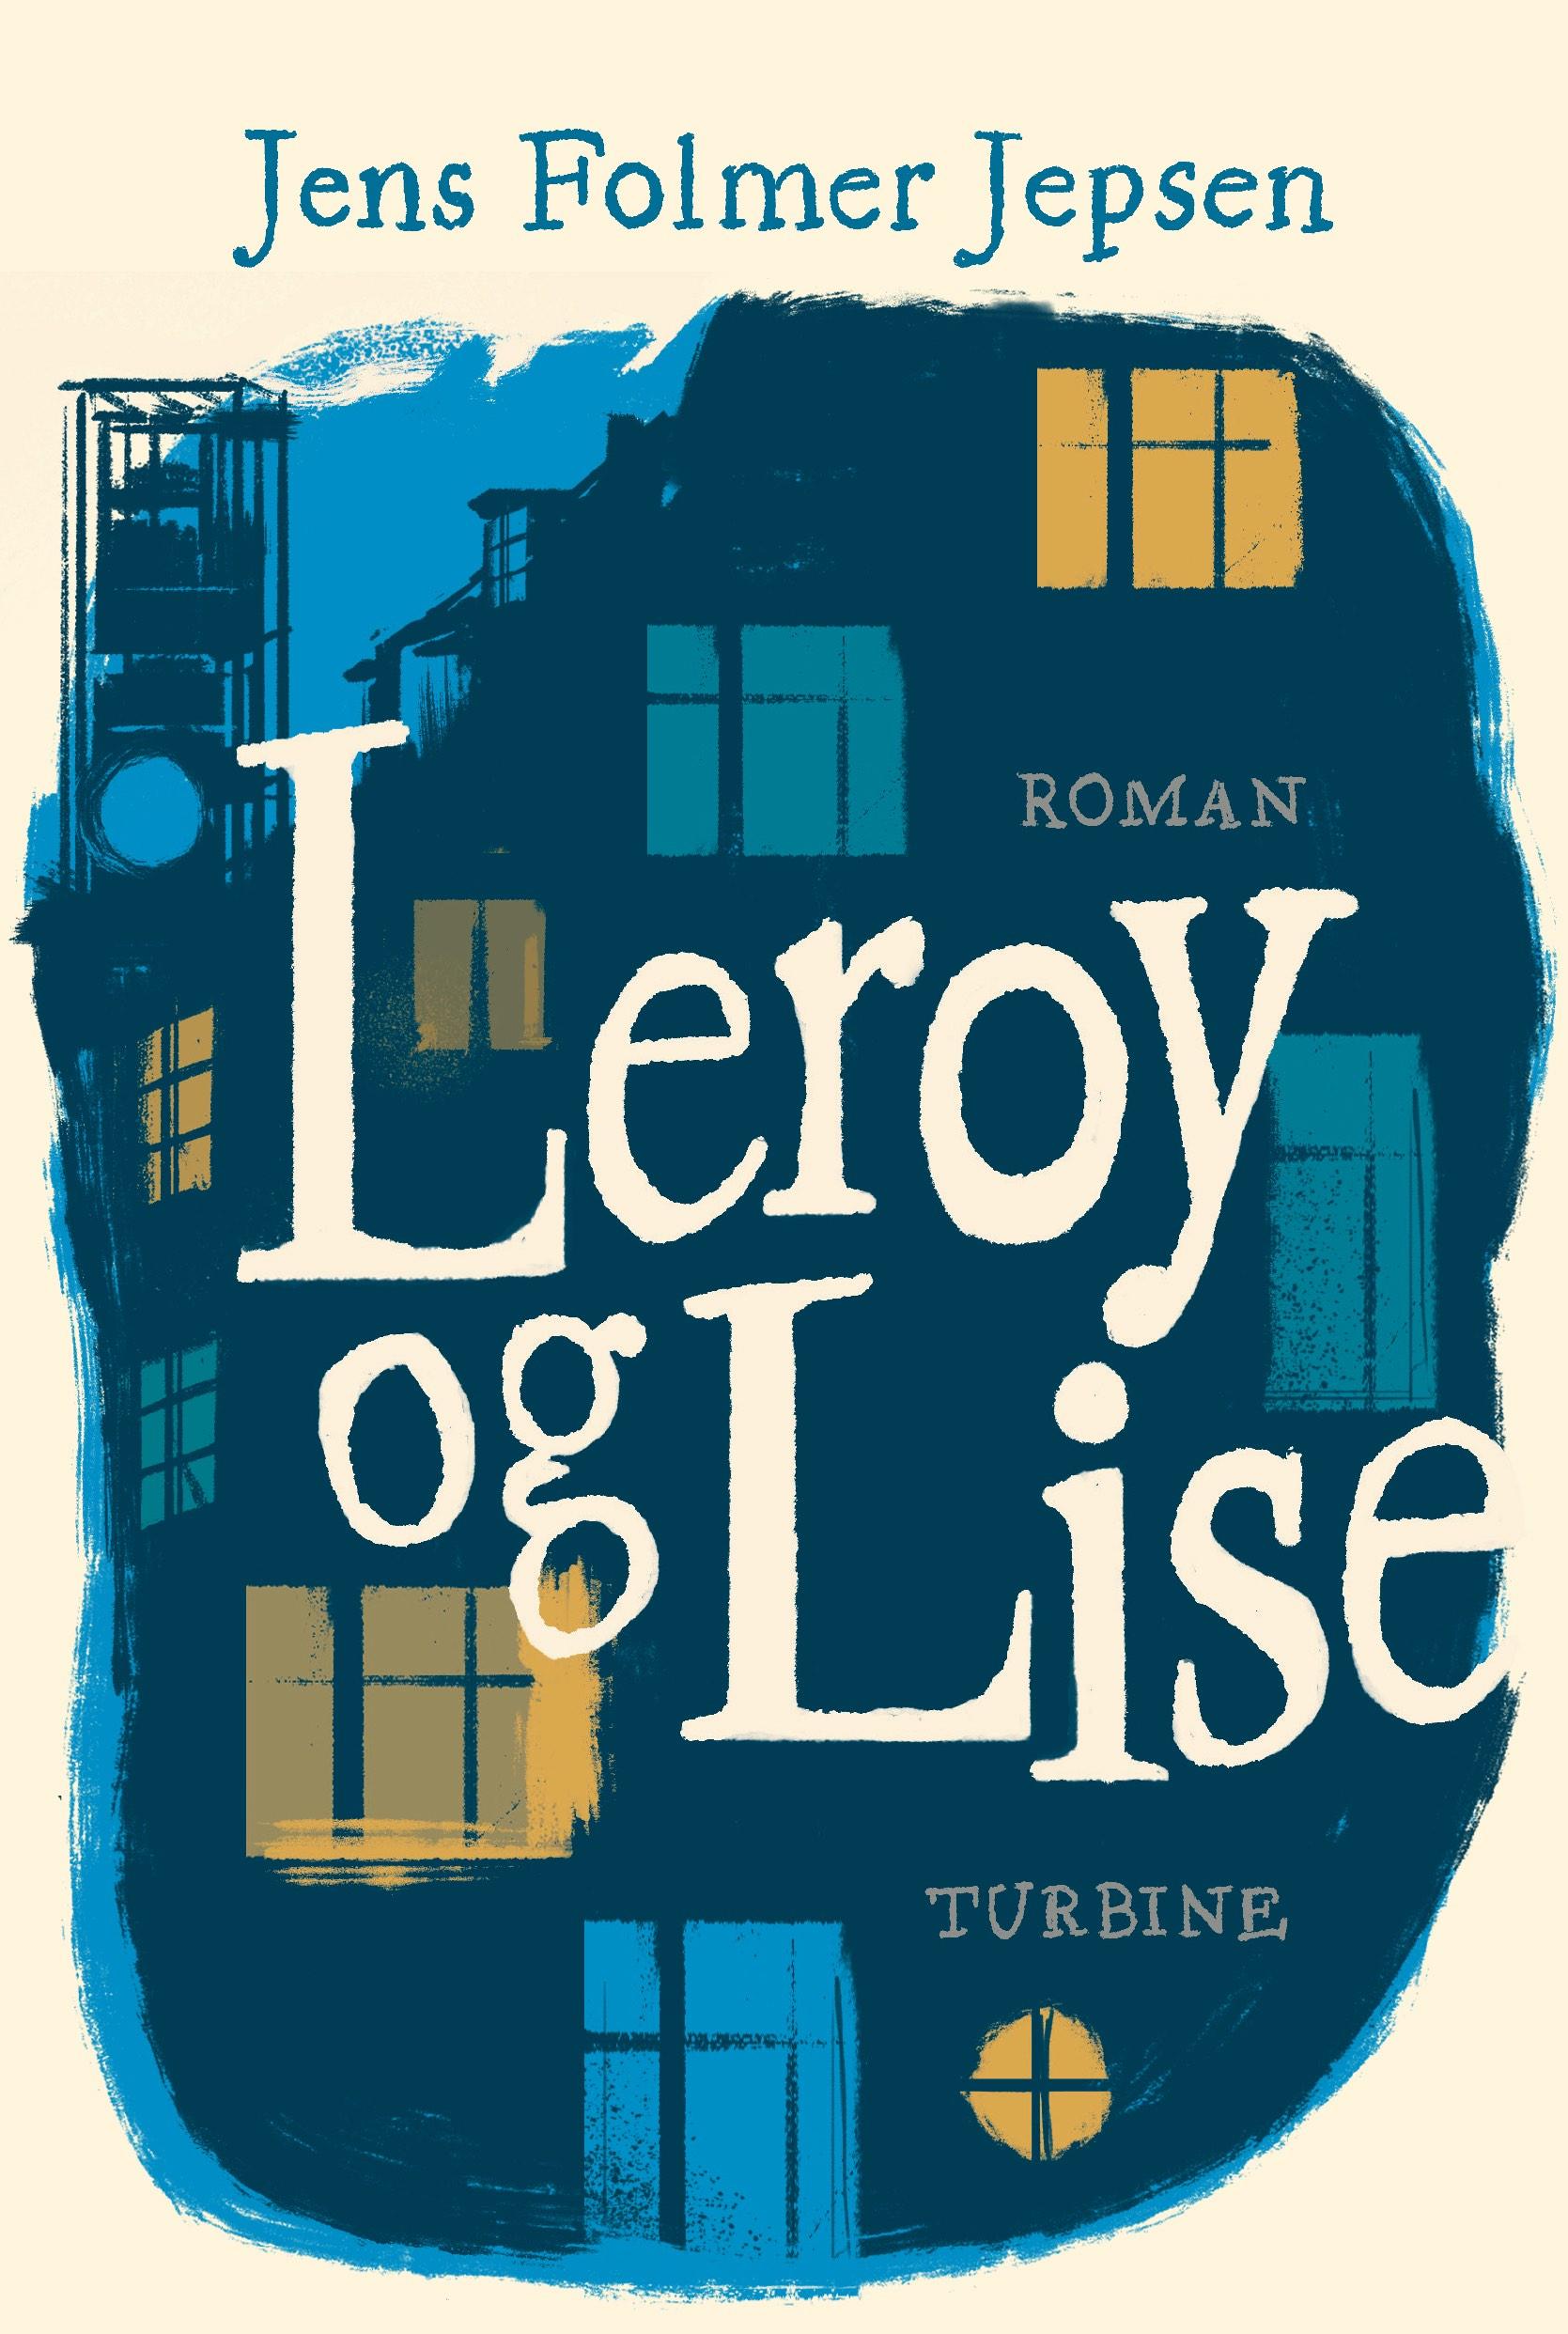 Leroy og Lise